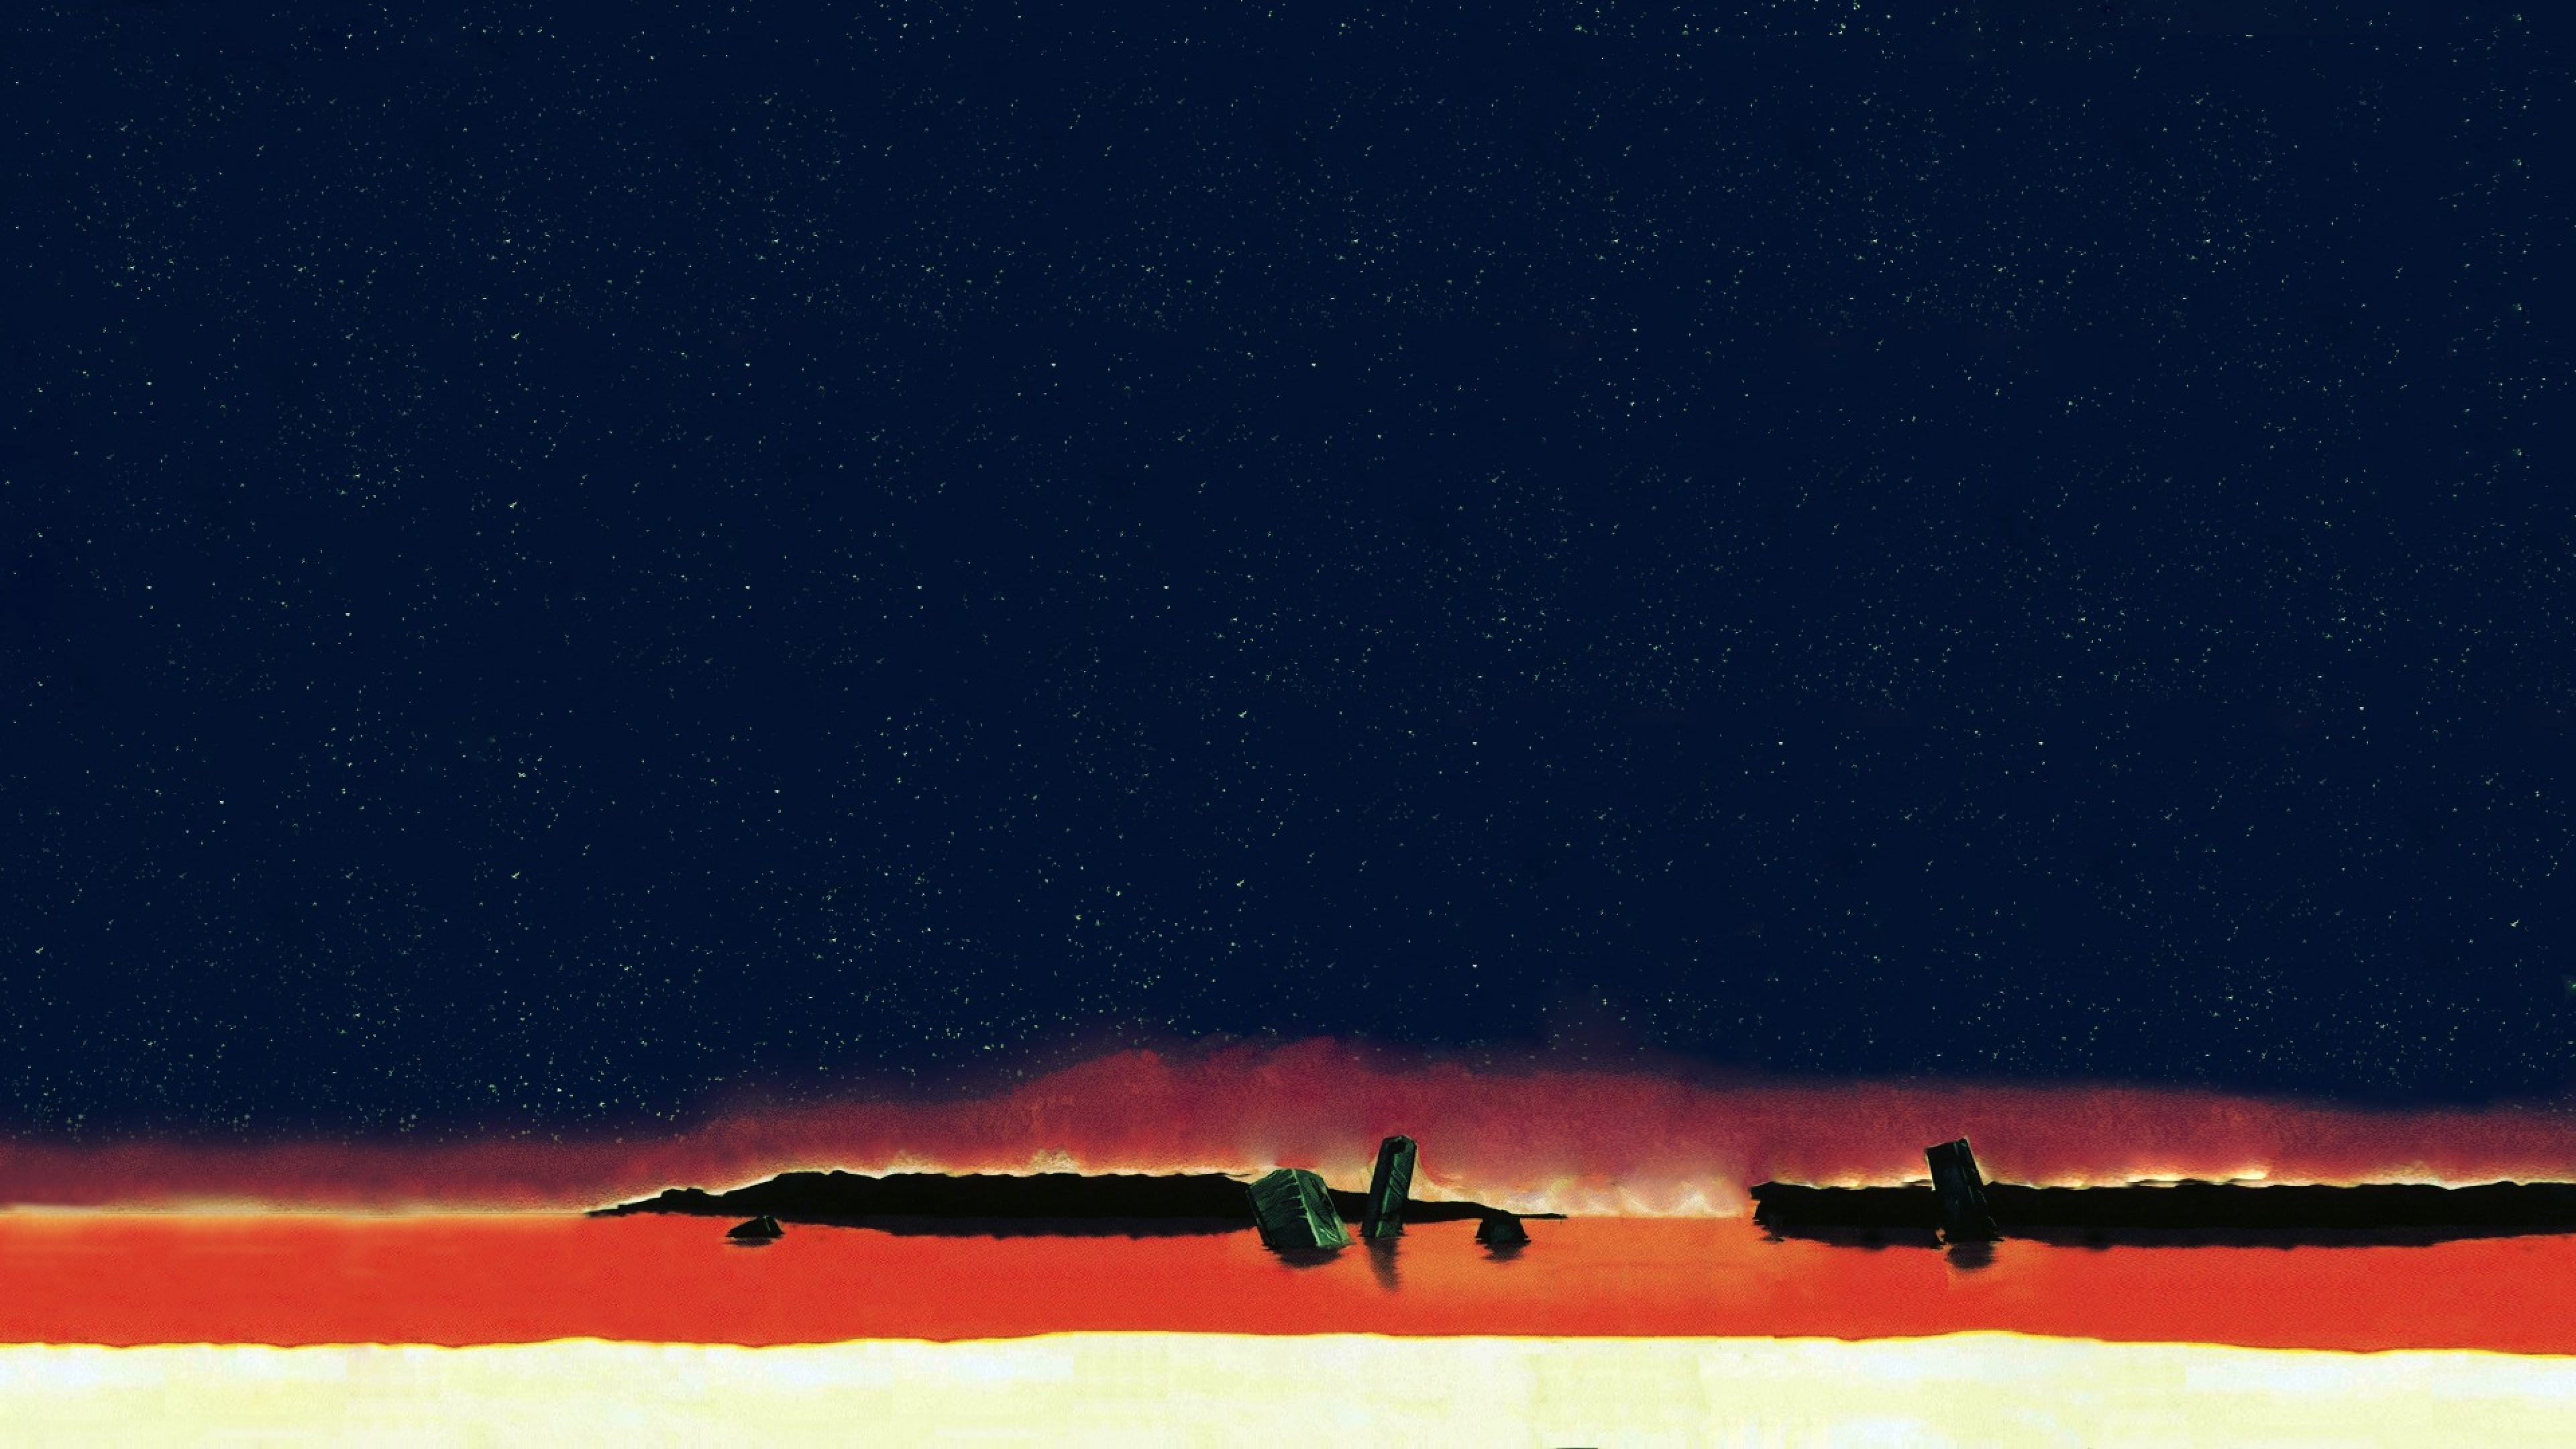 3840x2160 Neon Genesis Evangelion End Art 4k Wallpaper Hd Artist